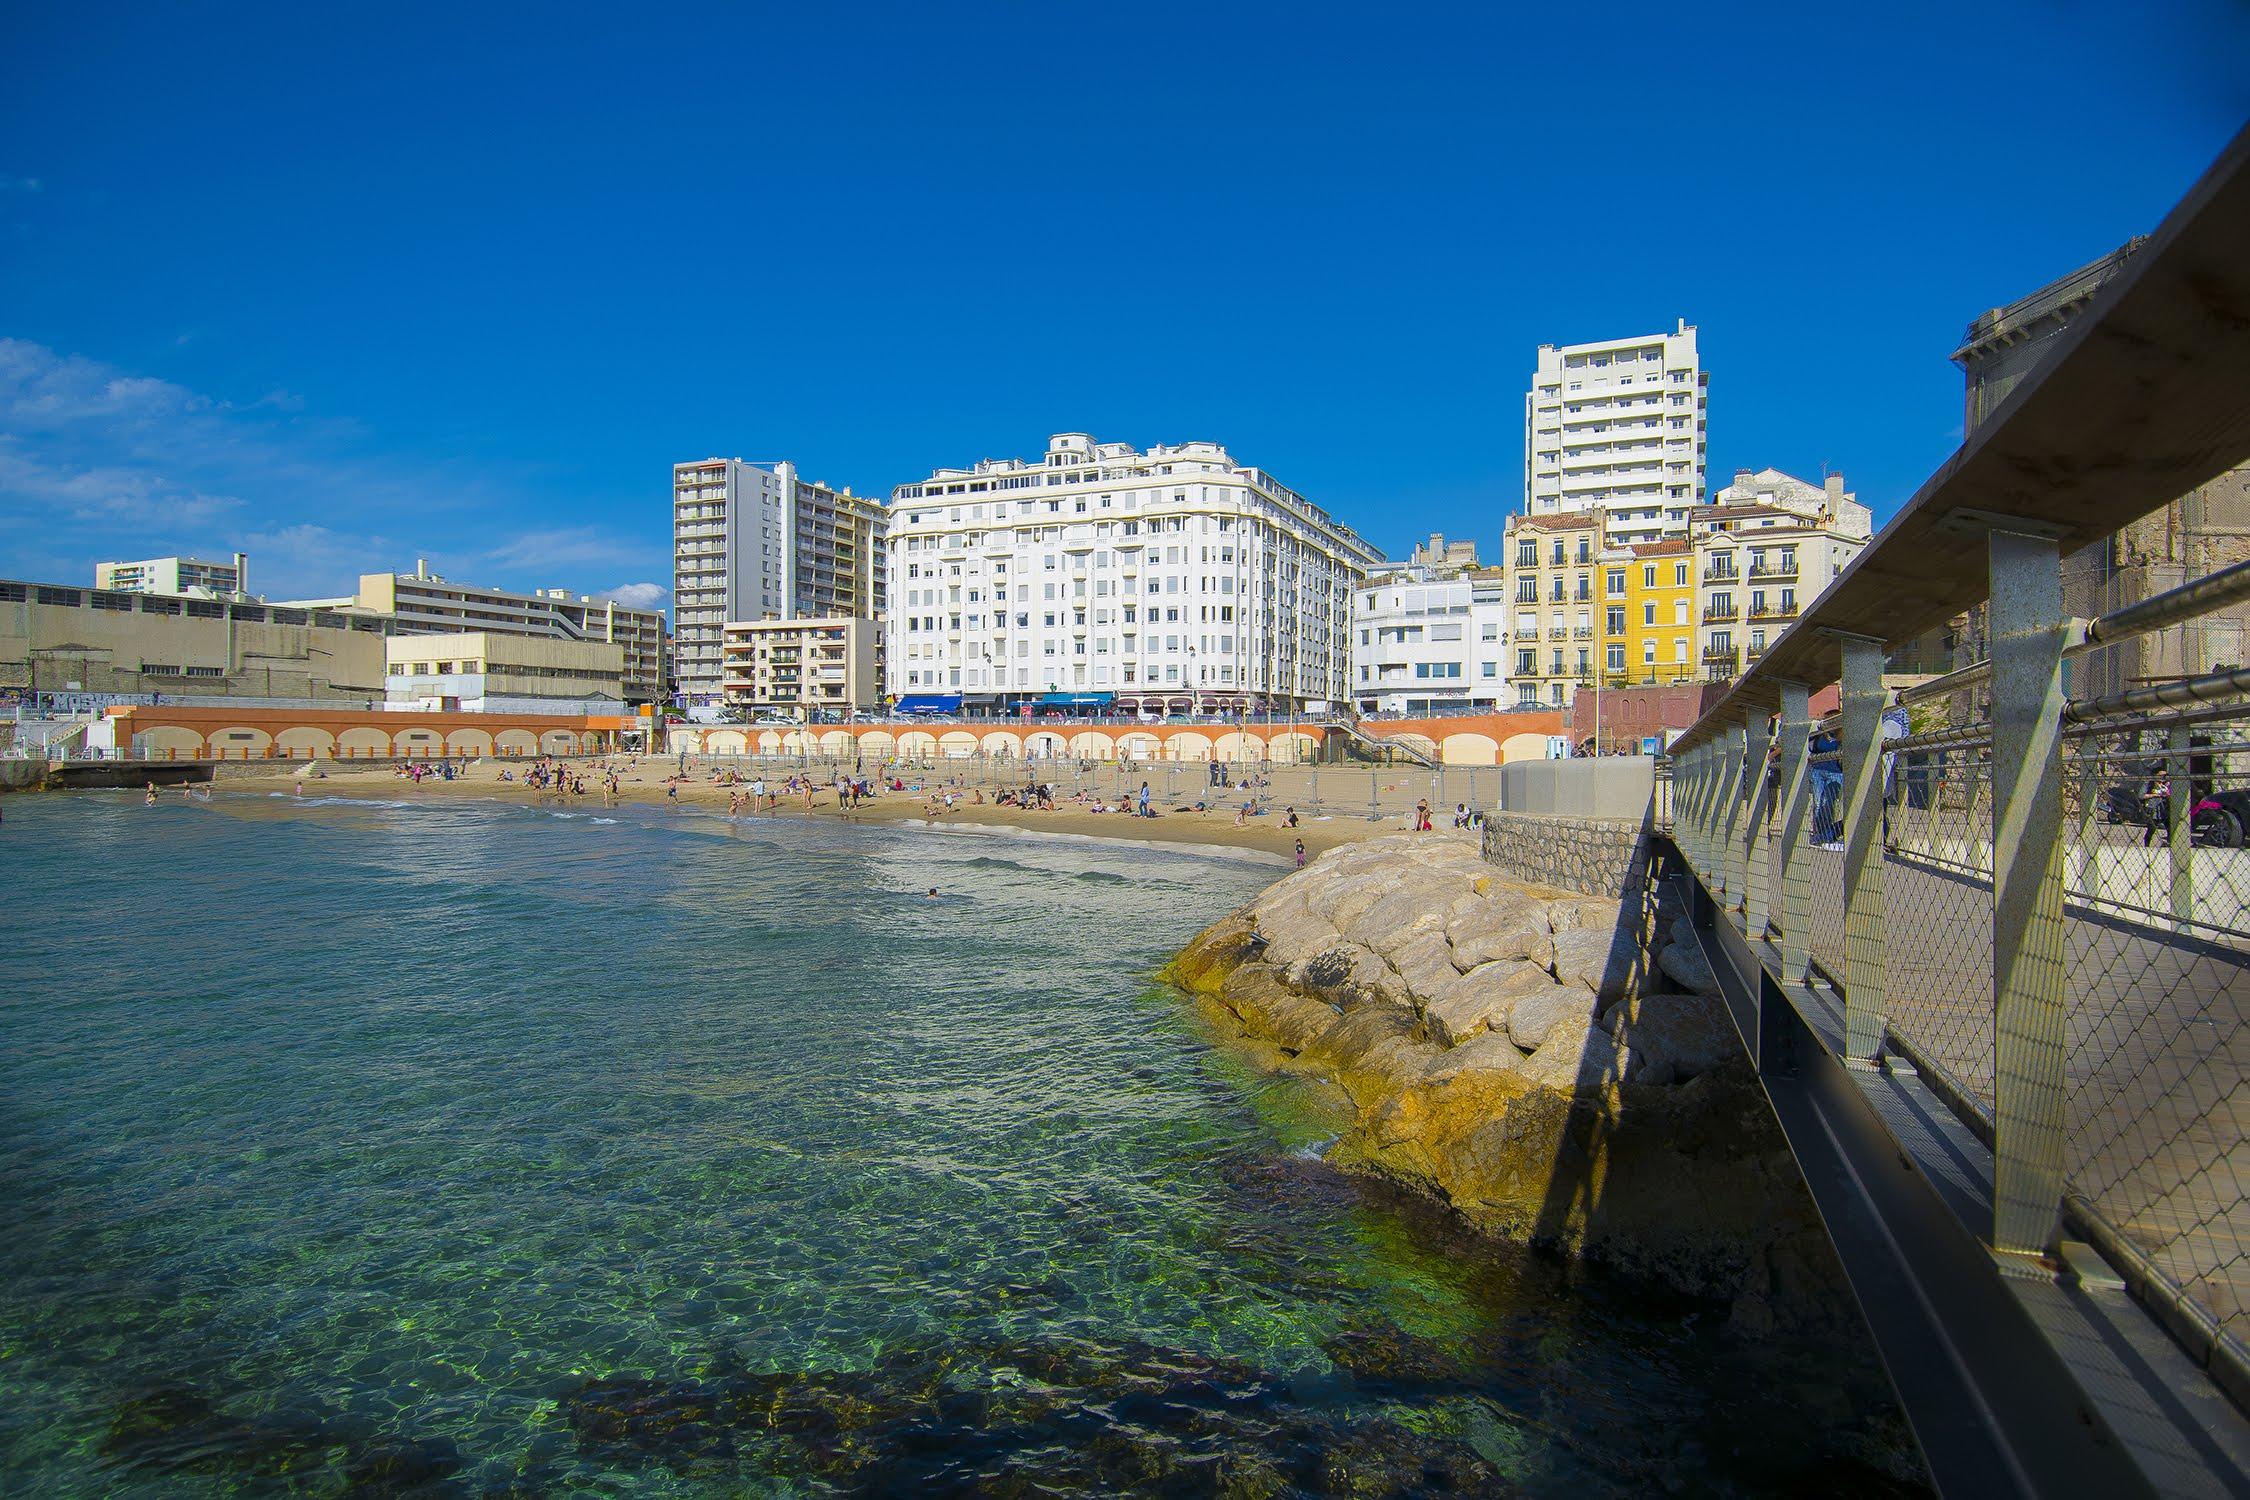 Plage_des_Catalans.jpg?1554470987